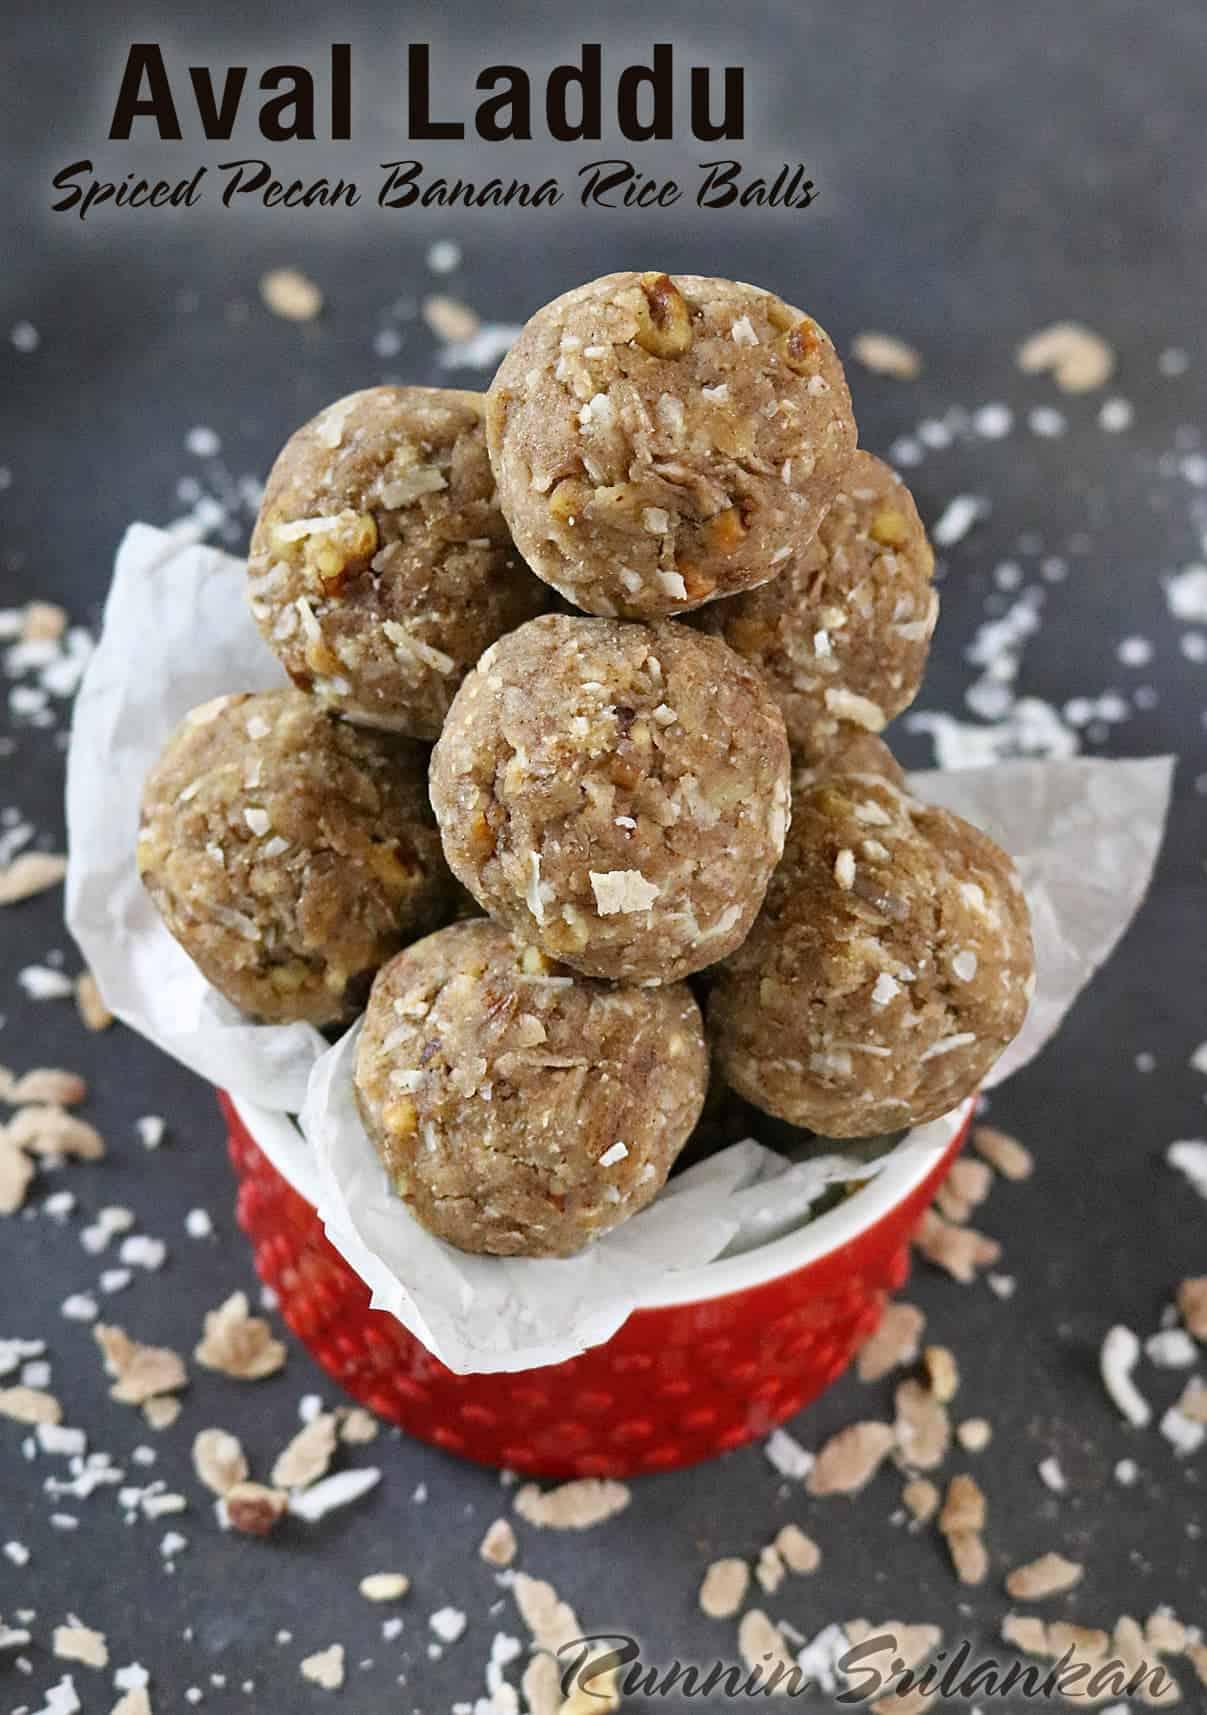 Spiced Pecan Banana Rice Balls - Aval Laddu